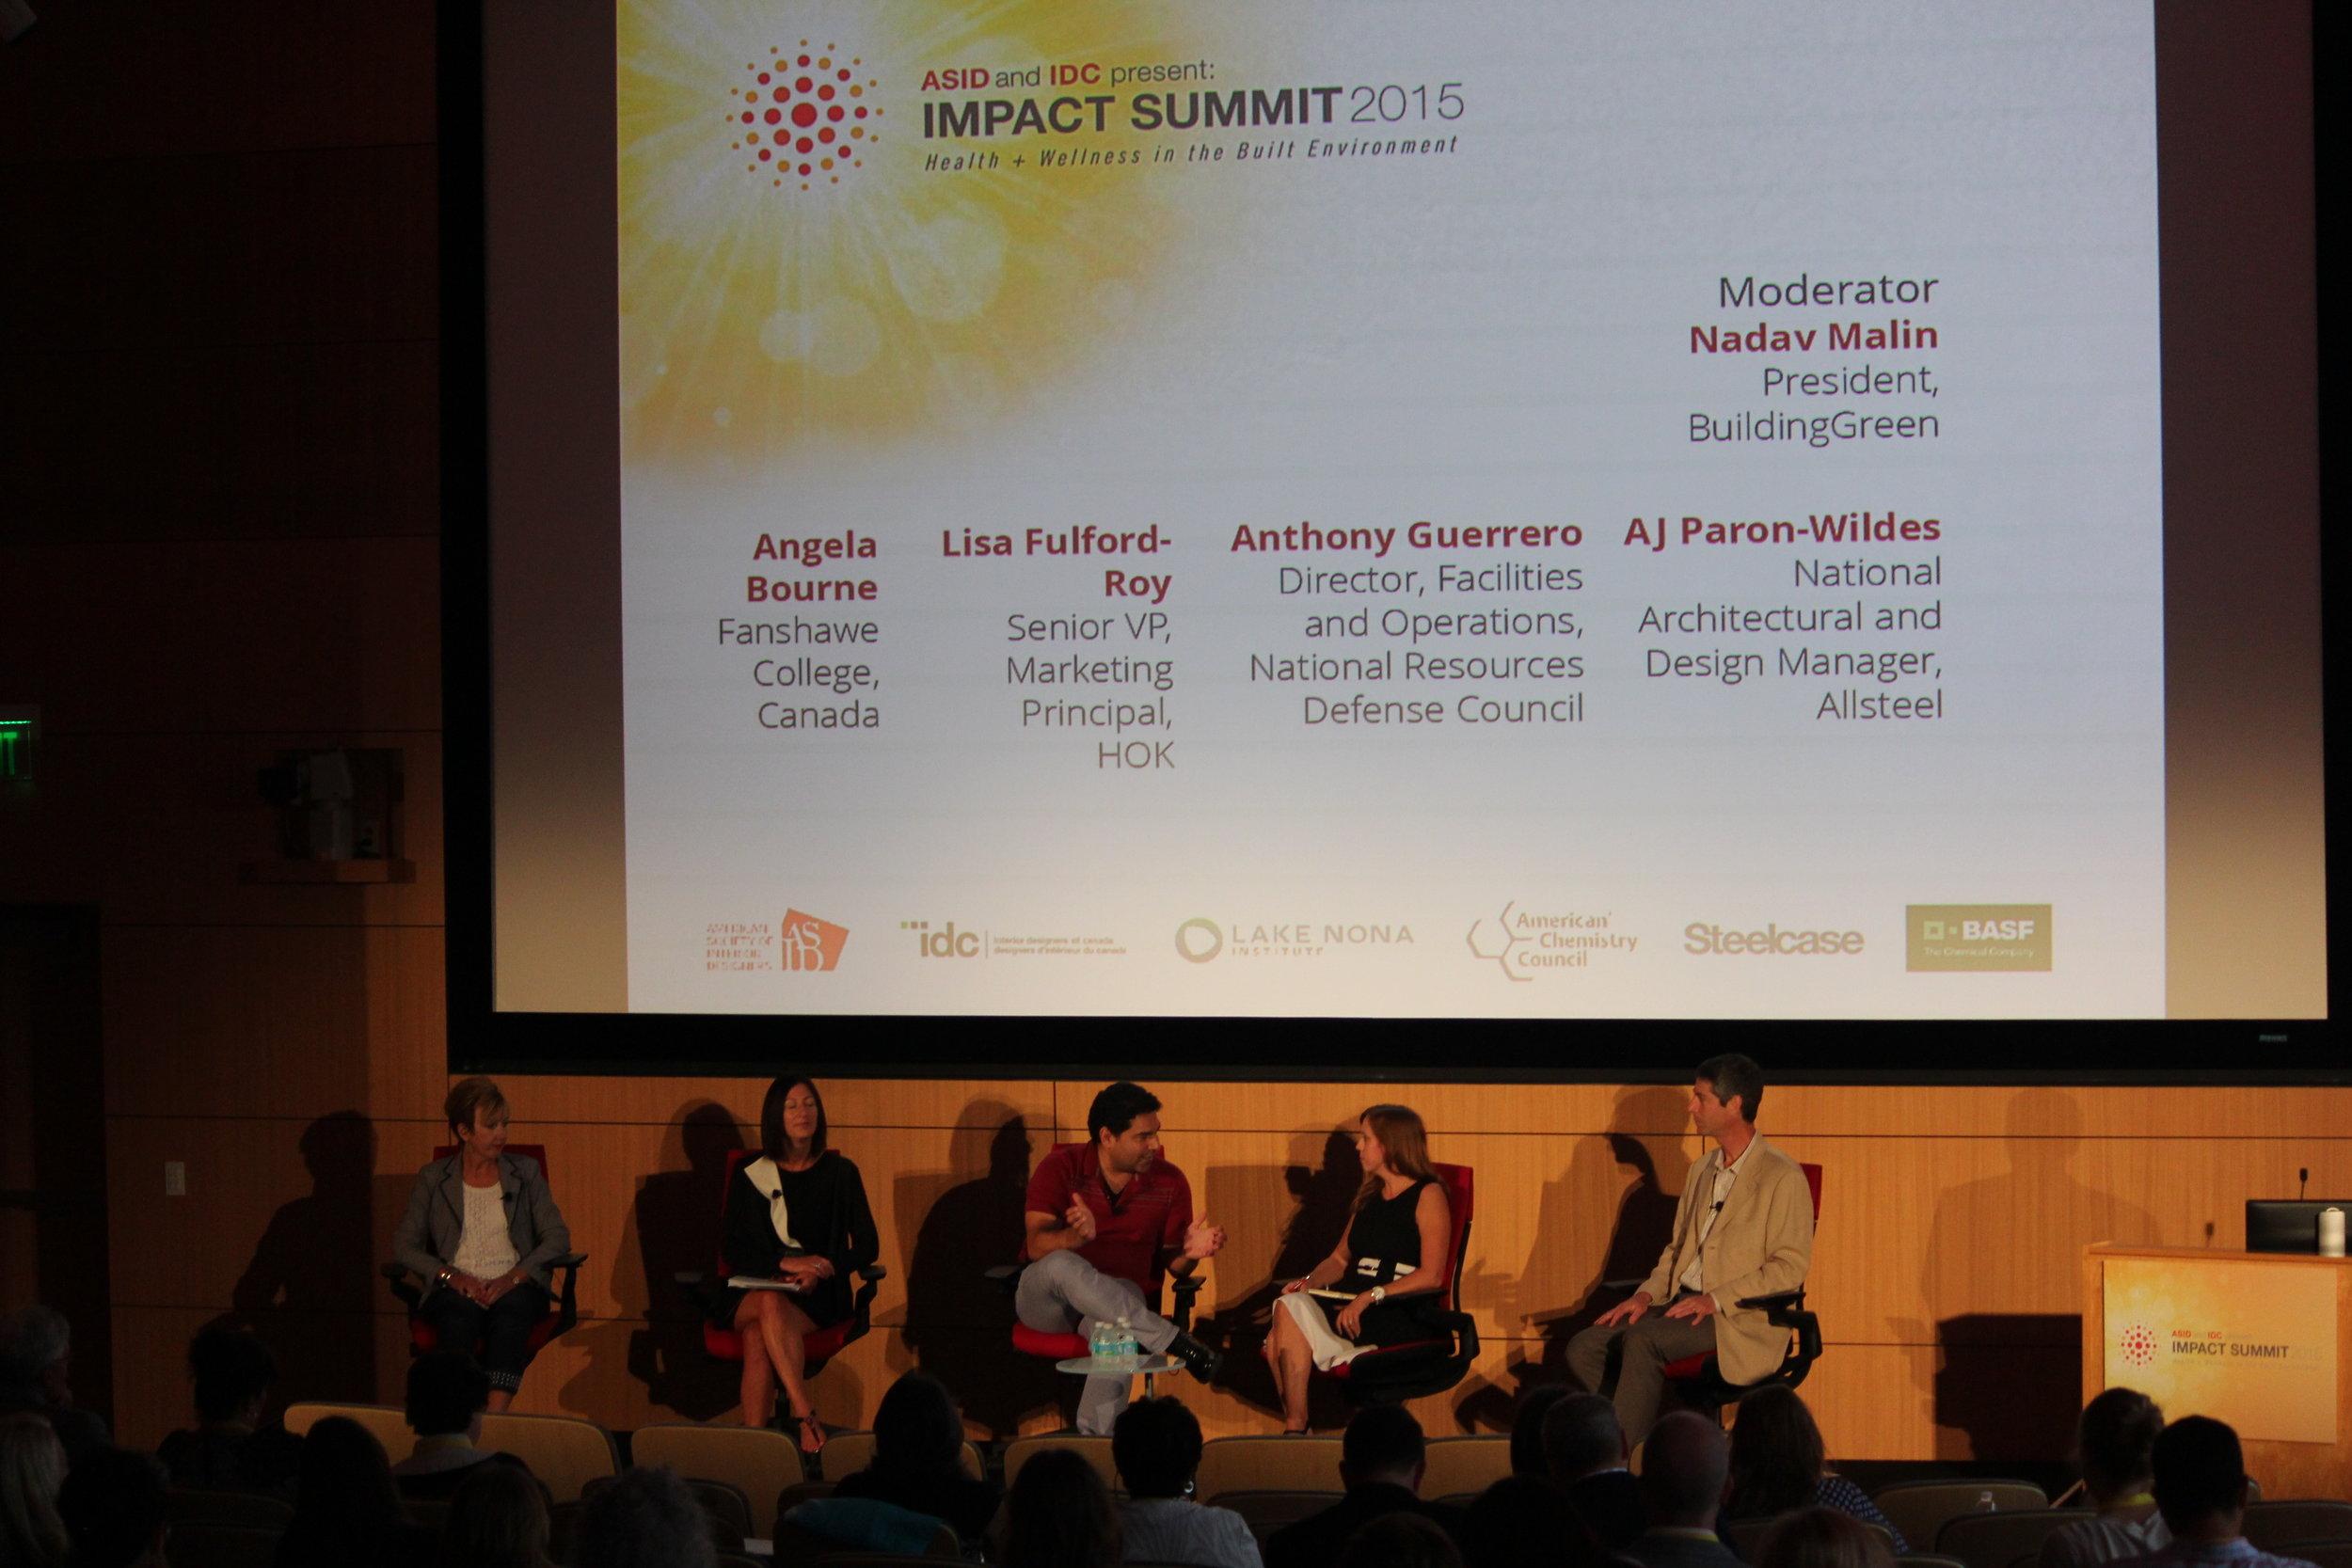 Impact Summit 2015 293.JPG